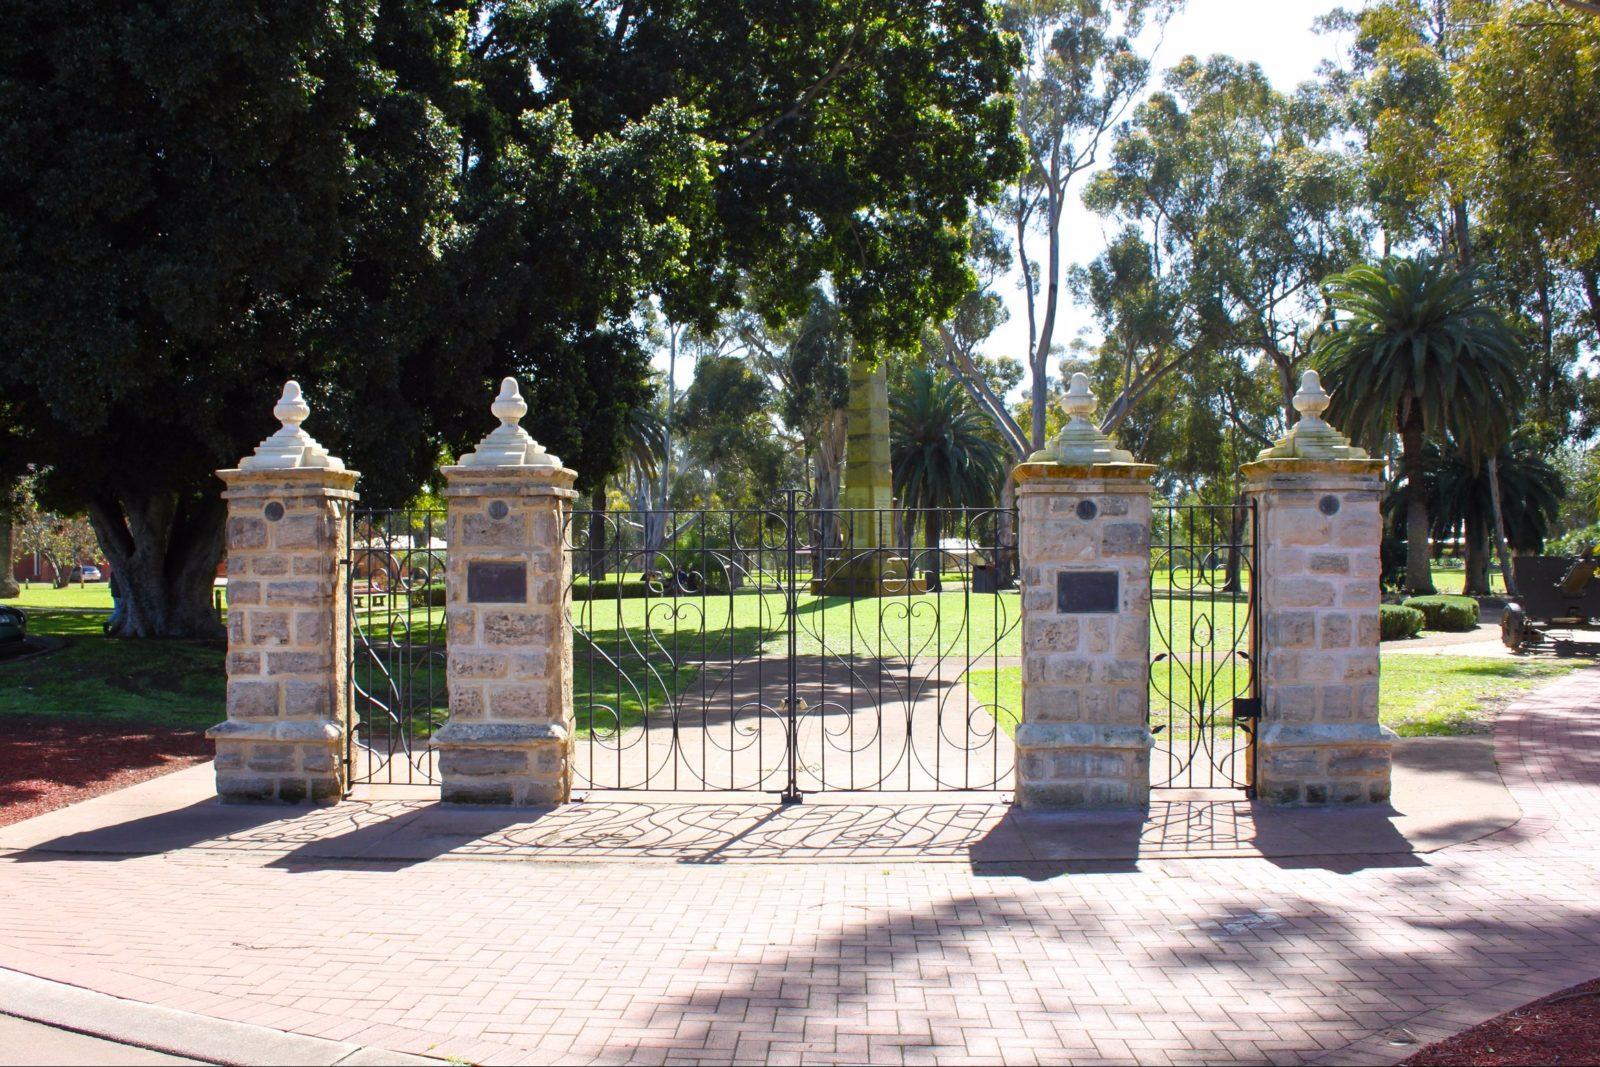 Stirling Square, Guildford, Western Australia